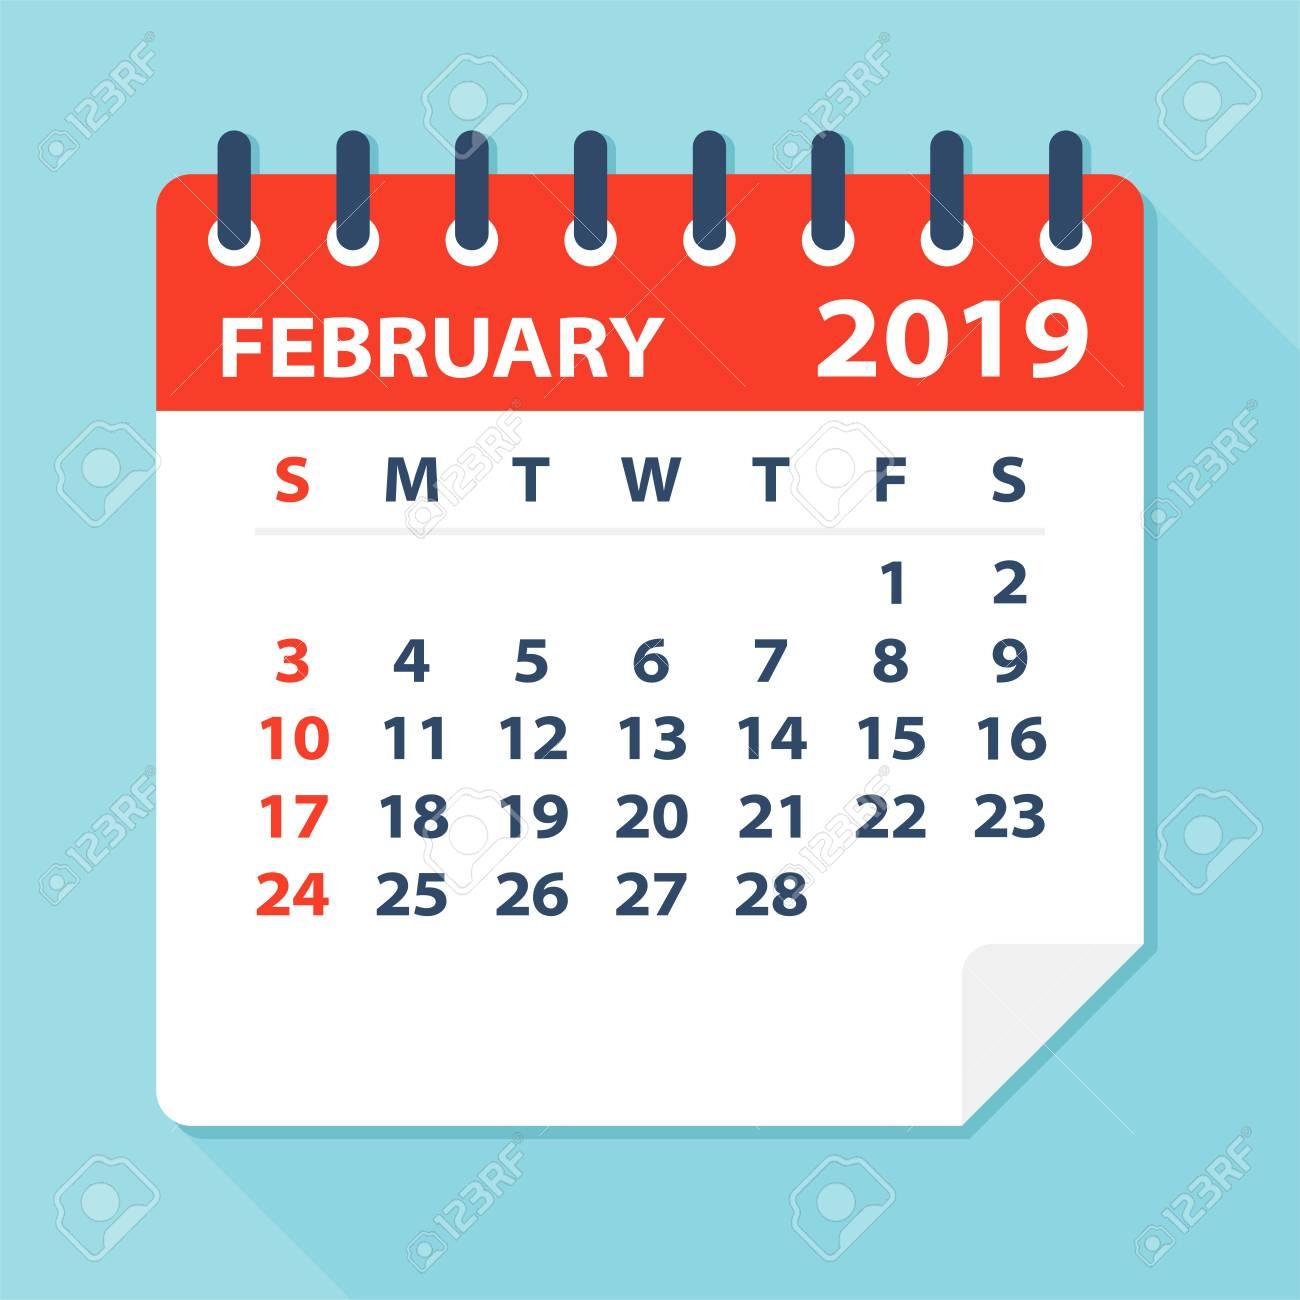 February 2019 Calendar Leaf.